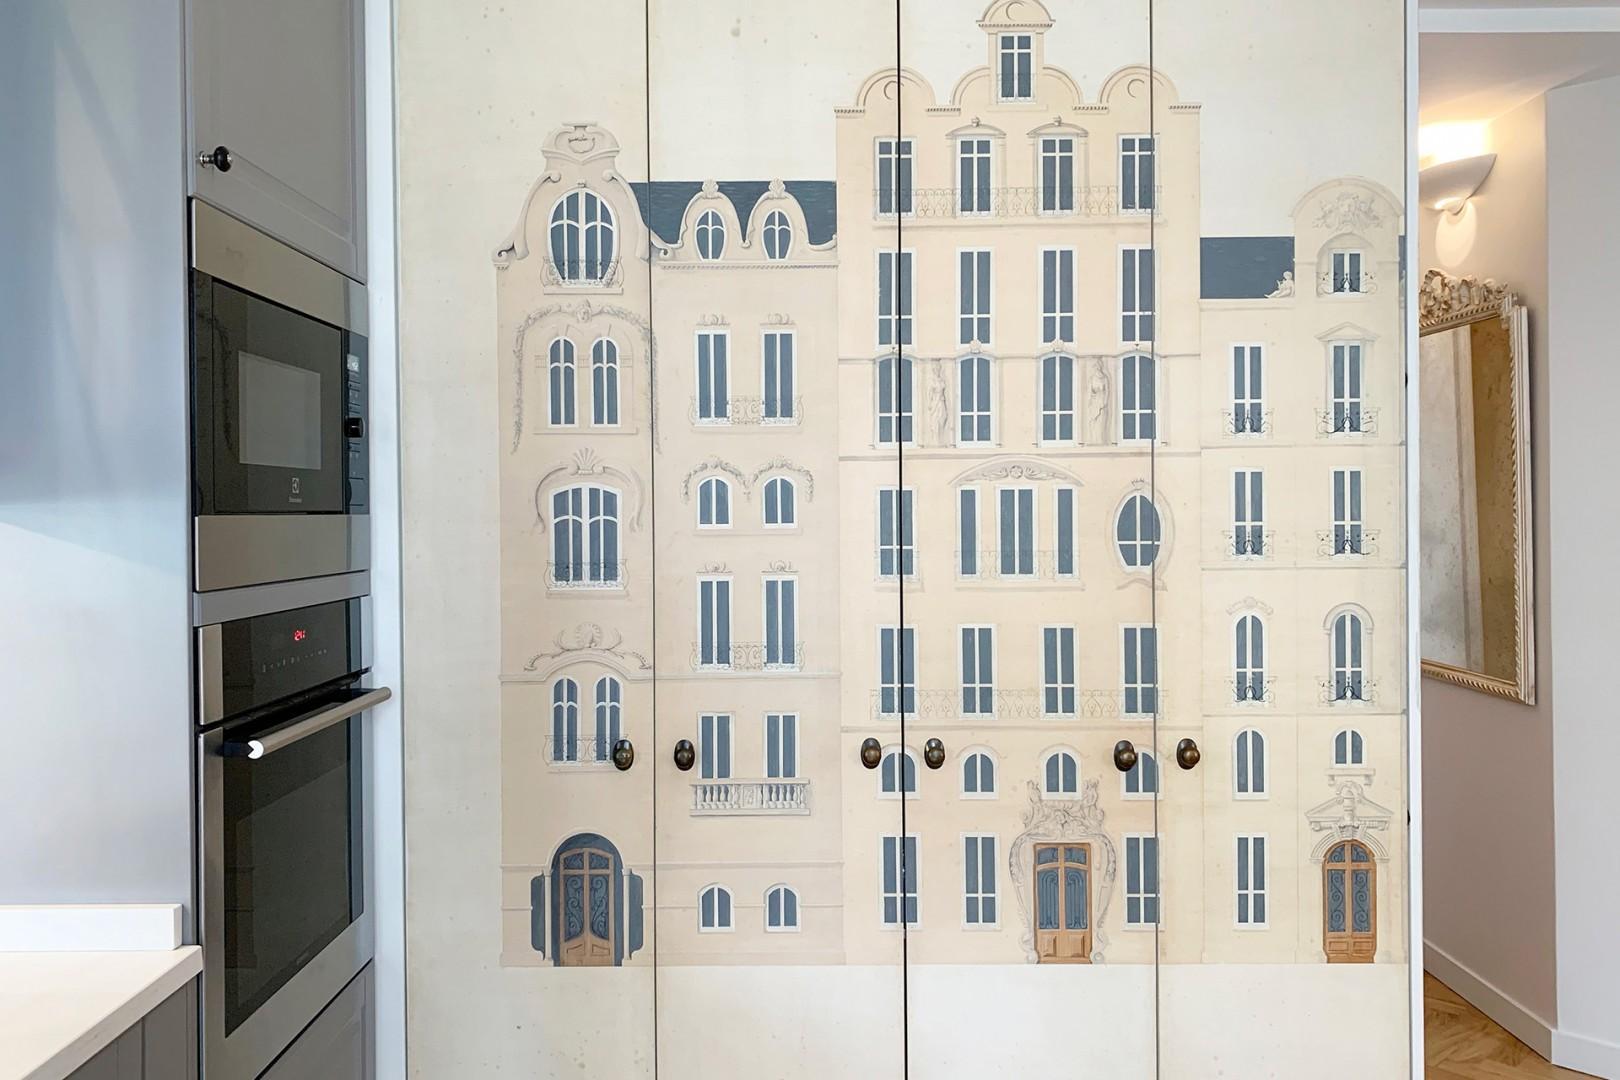 Hand painted Parisian street murals cover the closet doors.